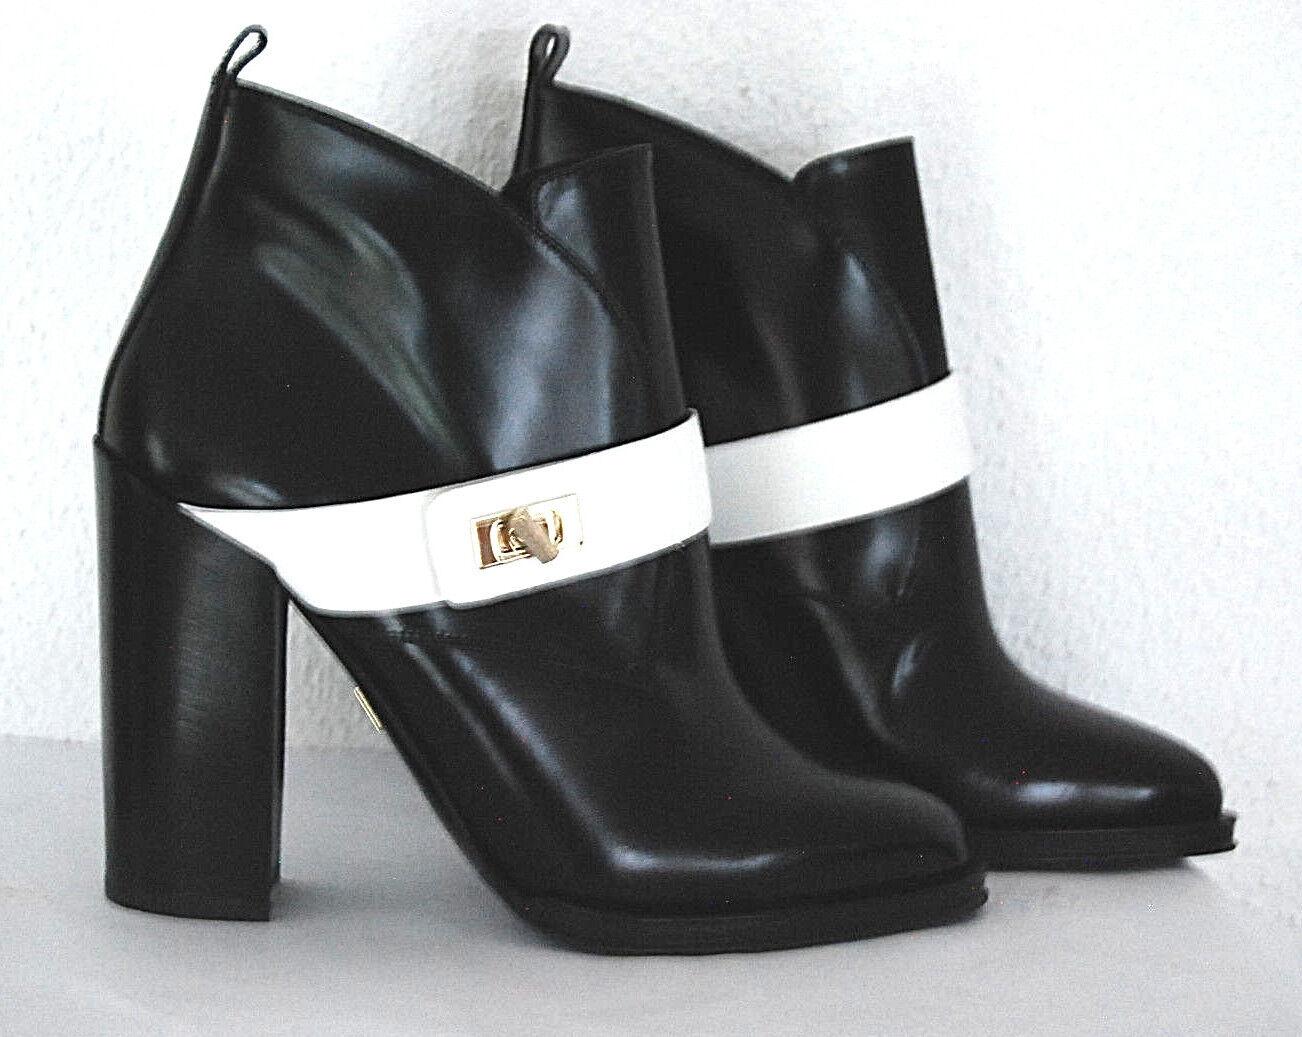 HUGO BOSS Stiefeletten Gr.40 Neu    schwarz Leder Stiefel Blend Schuhe 777350